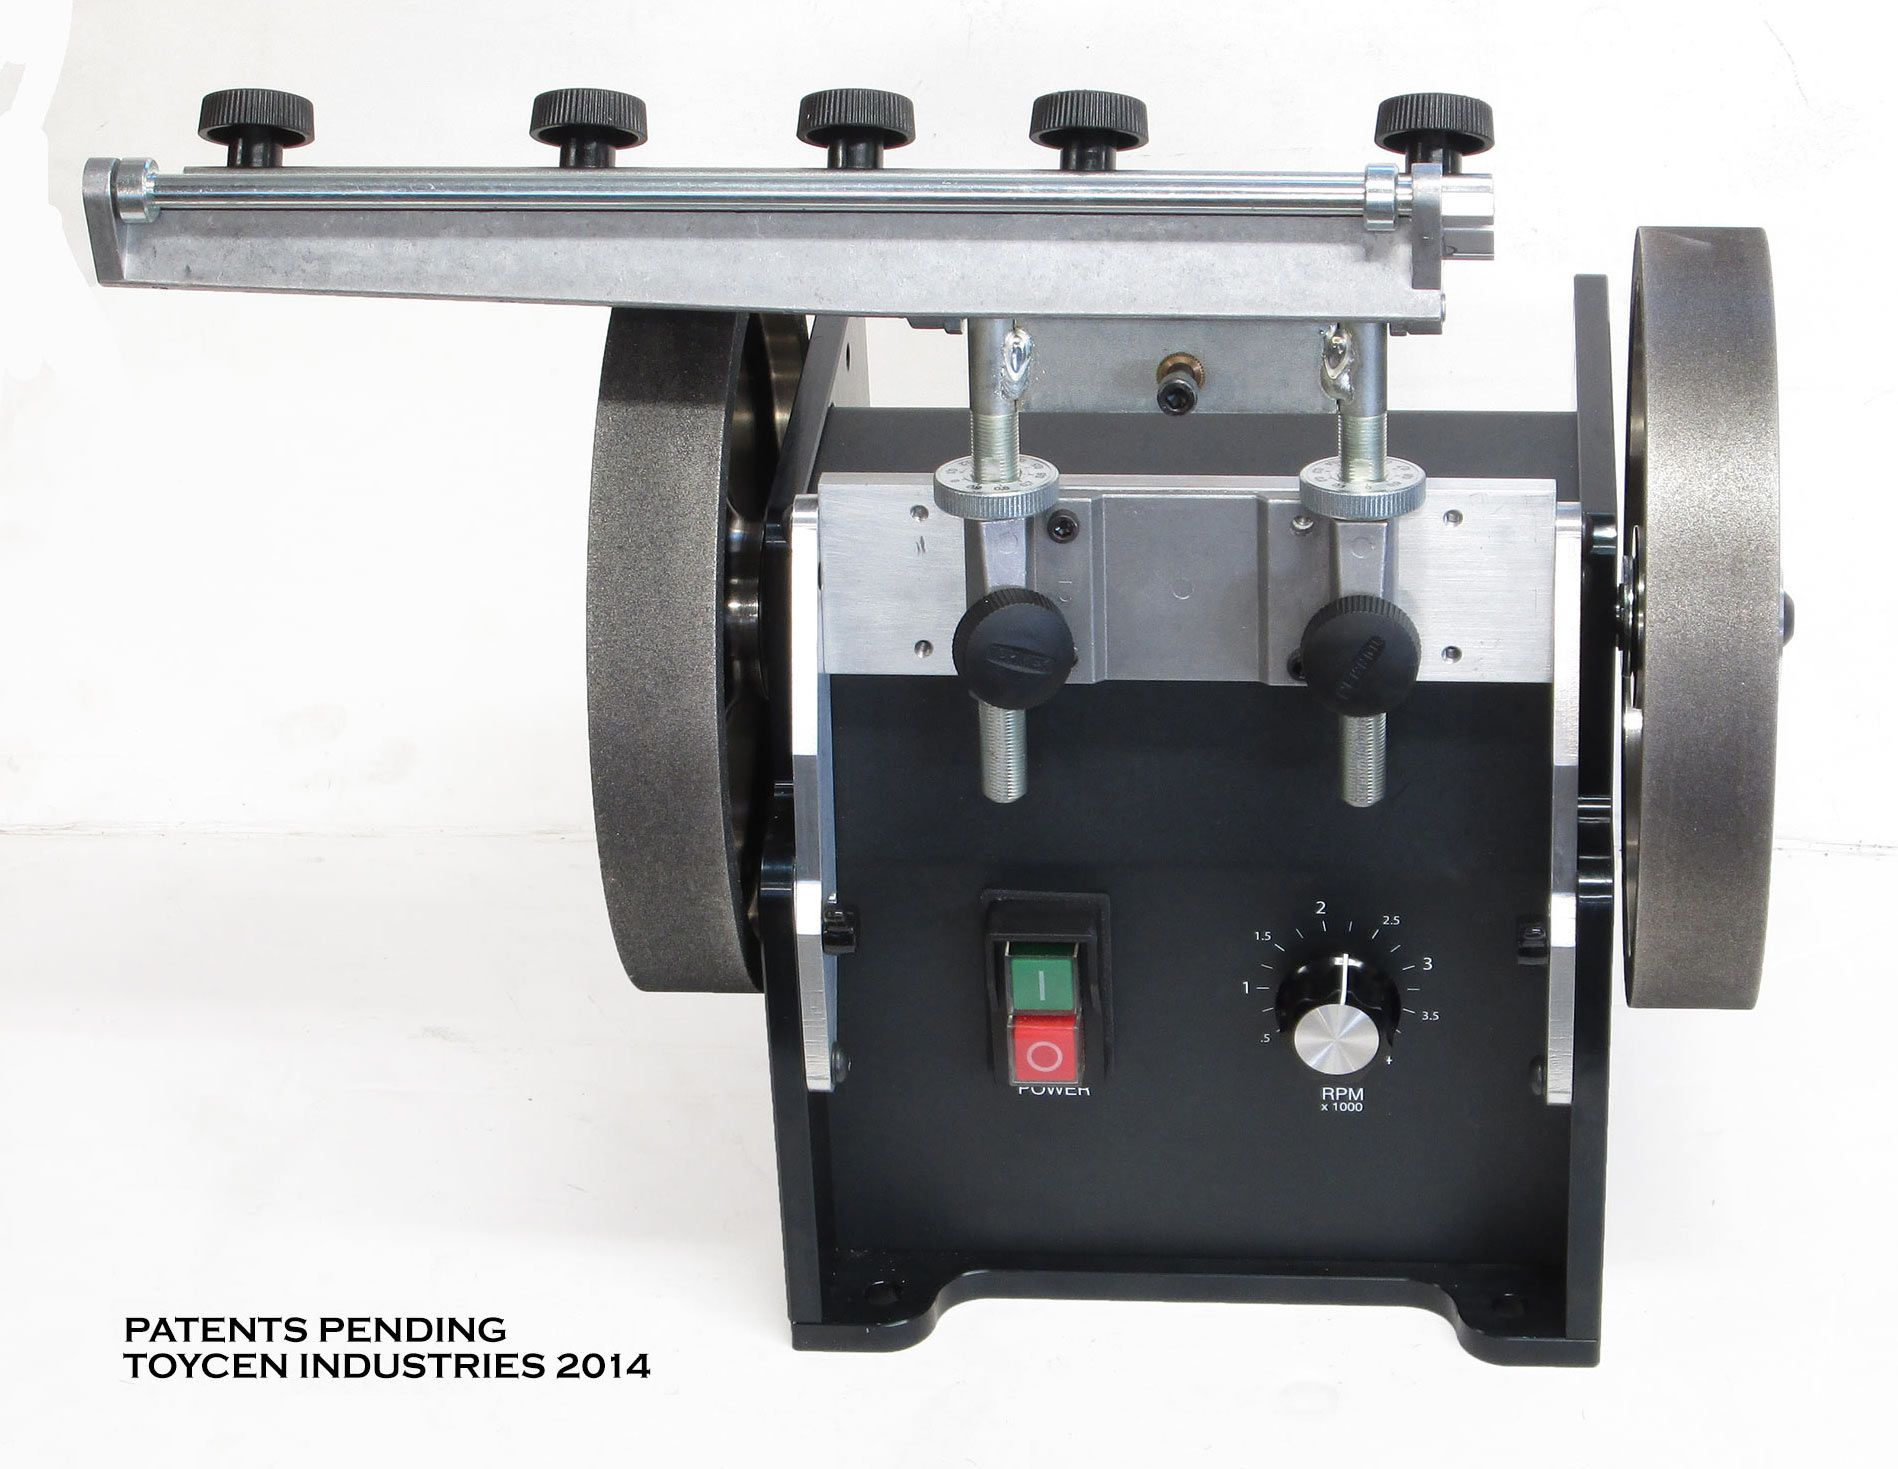 Peachy Tradesman Dc Belt Varable Speed With Reverse Knives Uwap Interior Chair Design Uwaporg